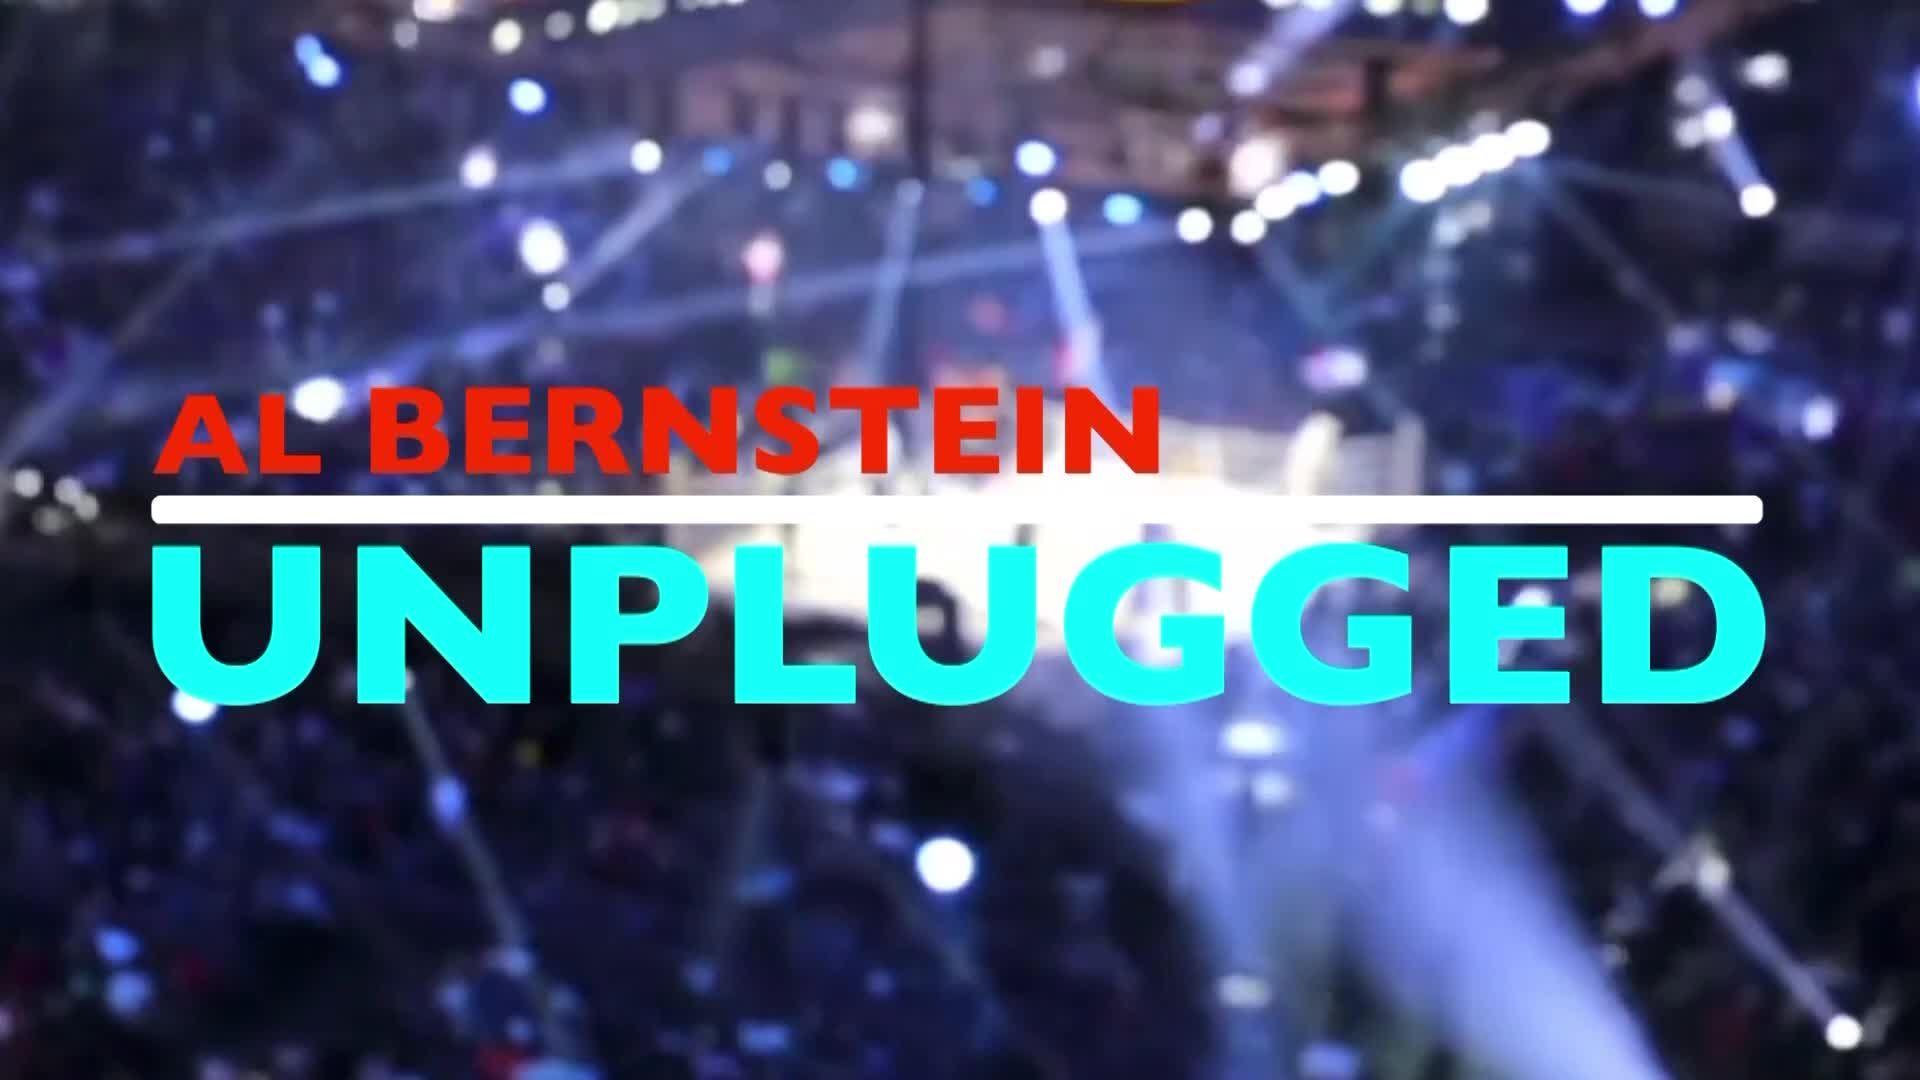 Al Bernstein Unplugged: Brandun Lee